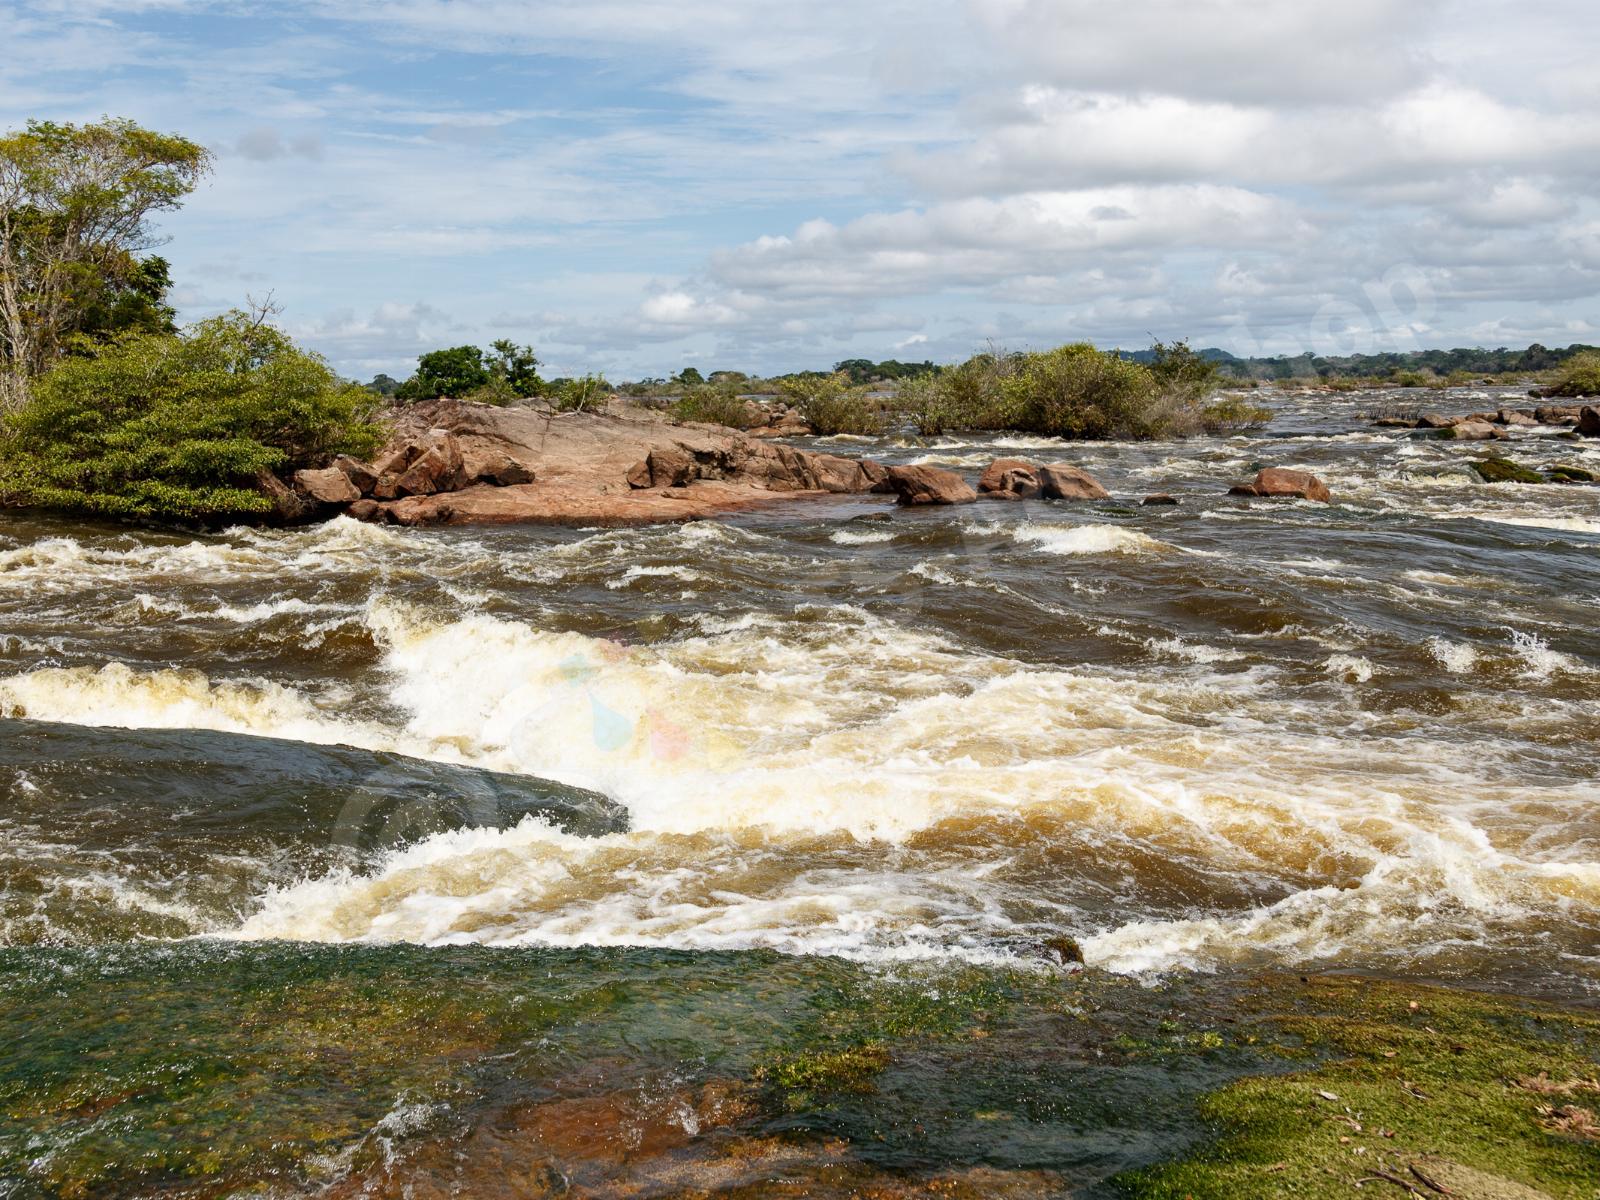 rio iriri  cachoeira grande  andreas tanke 0201 8